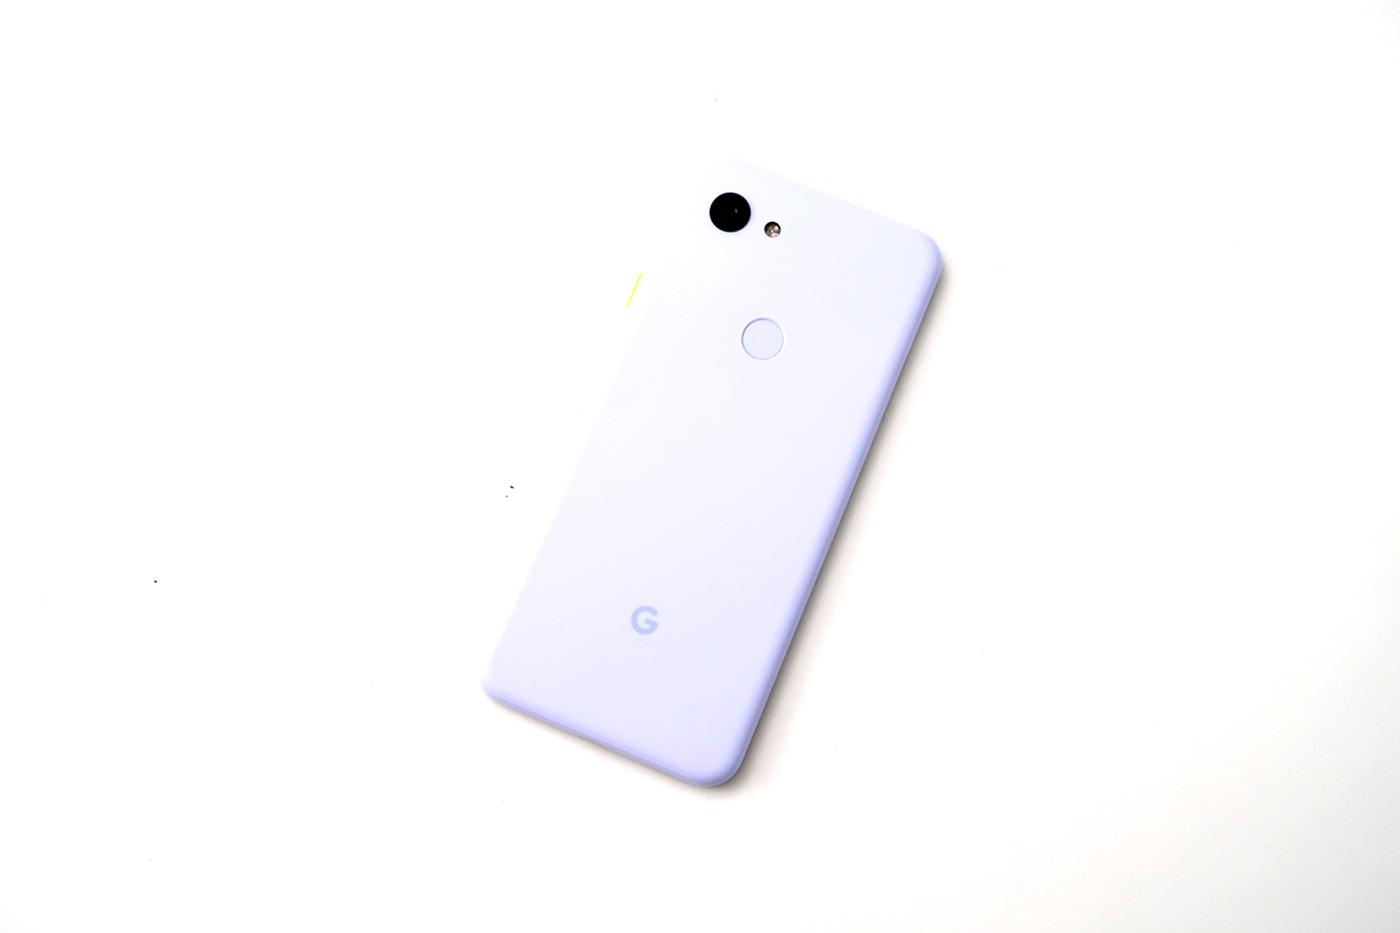 Google Pixel 3a SoftBank [Purple-ish]